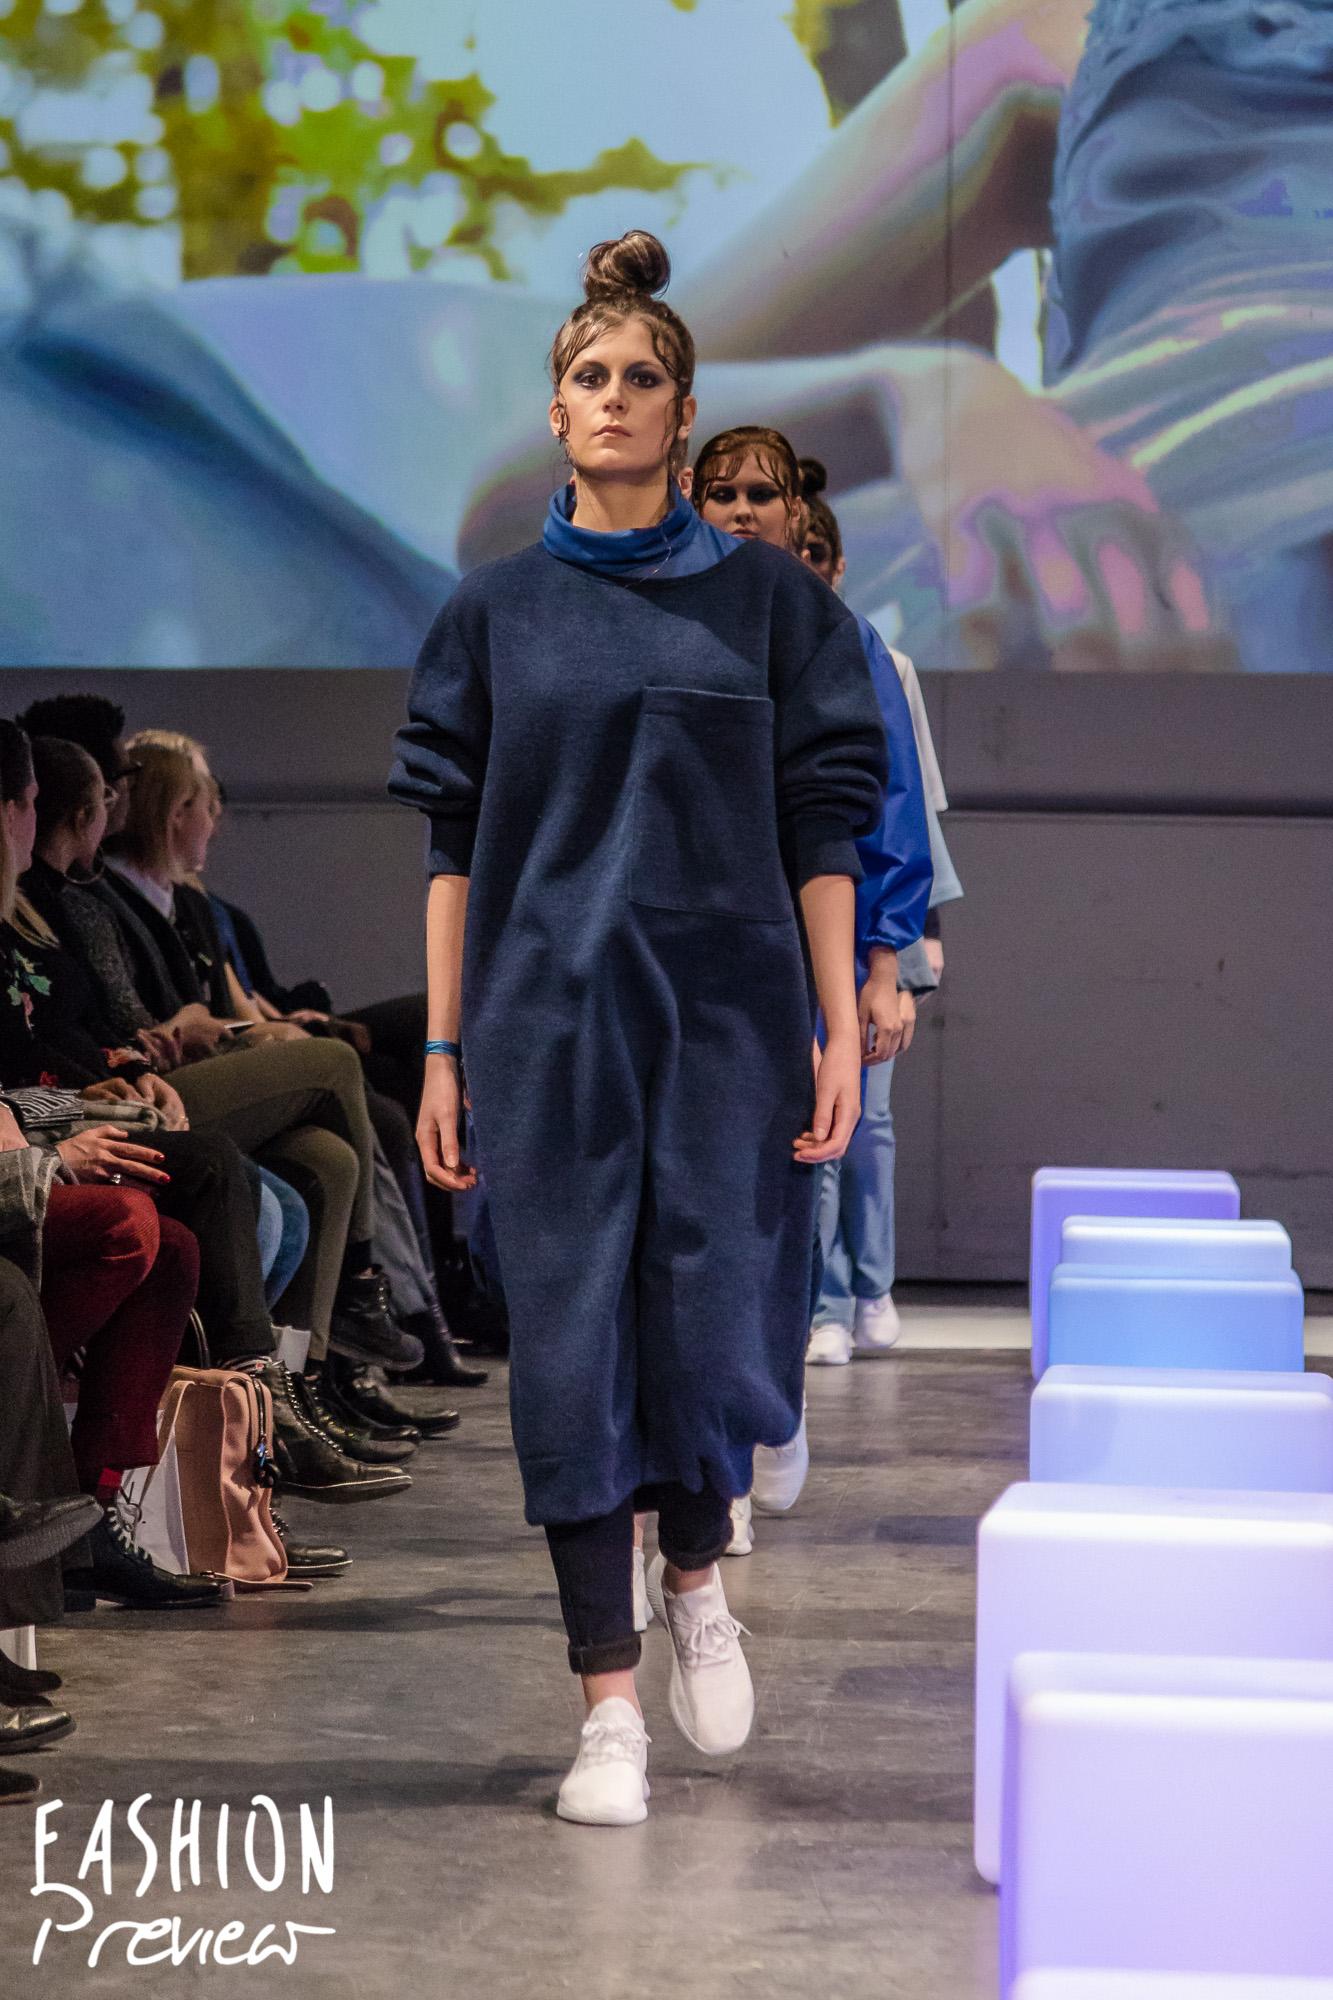 Fashion Preview 9 - Cegep Marie Victorin-01.jpg